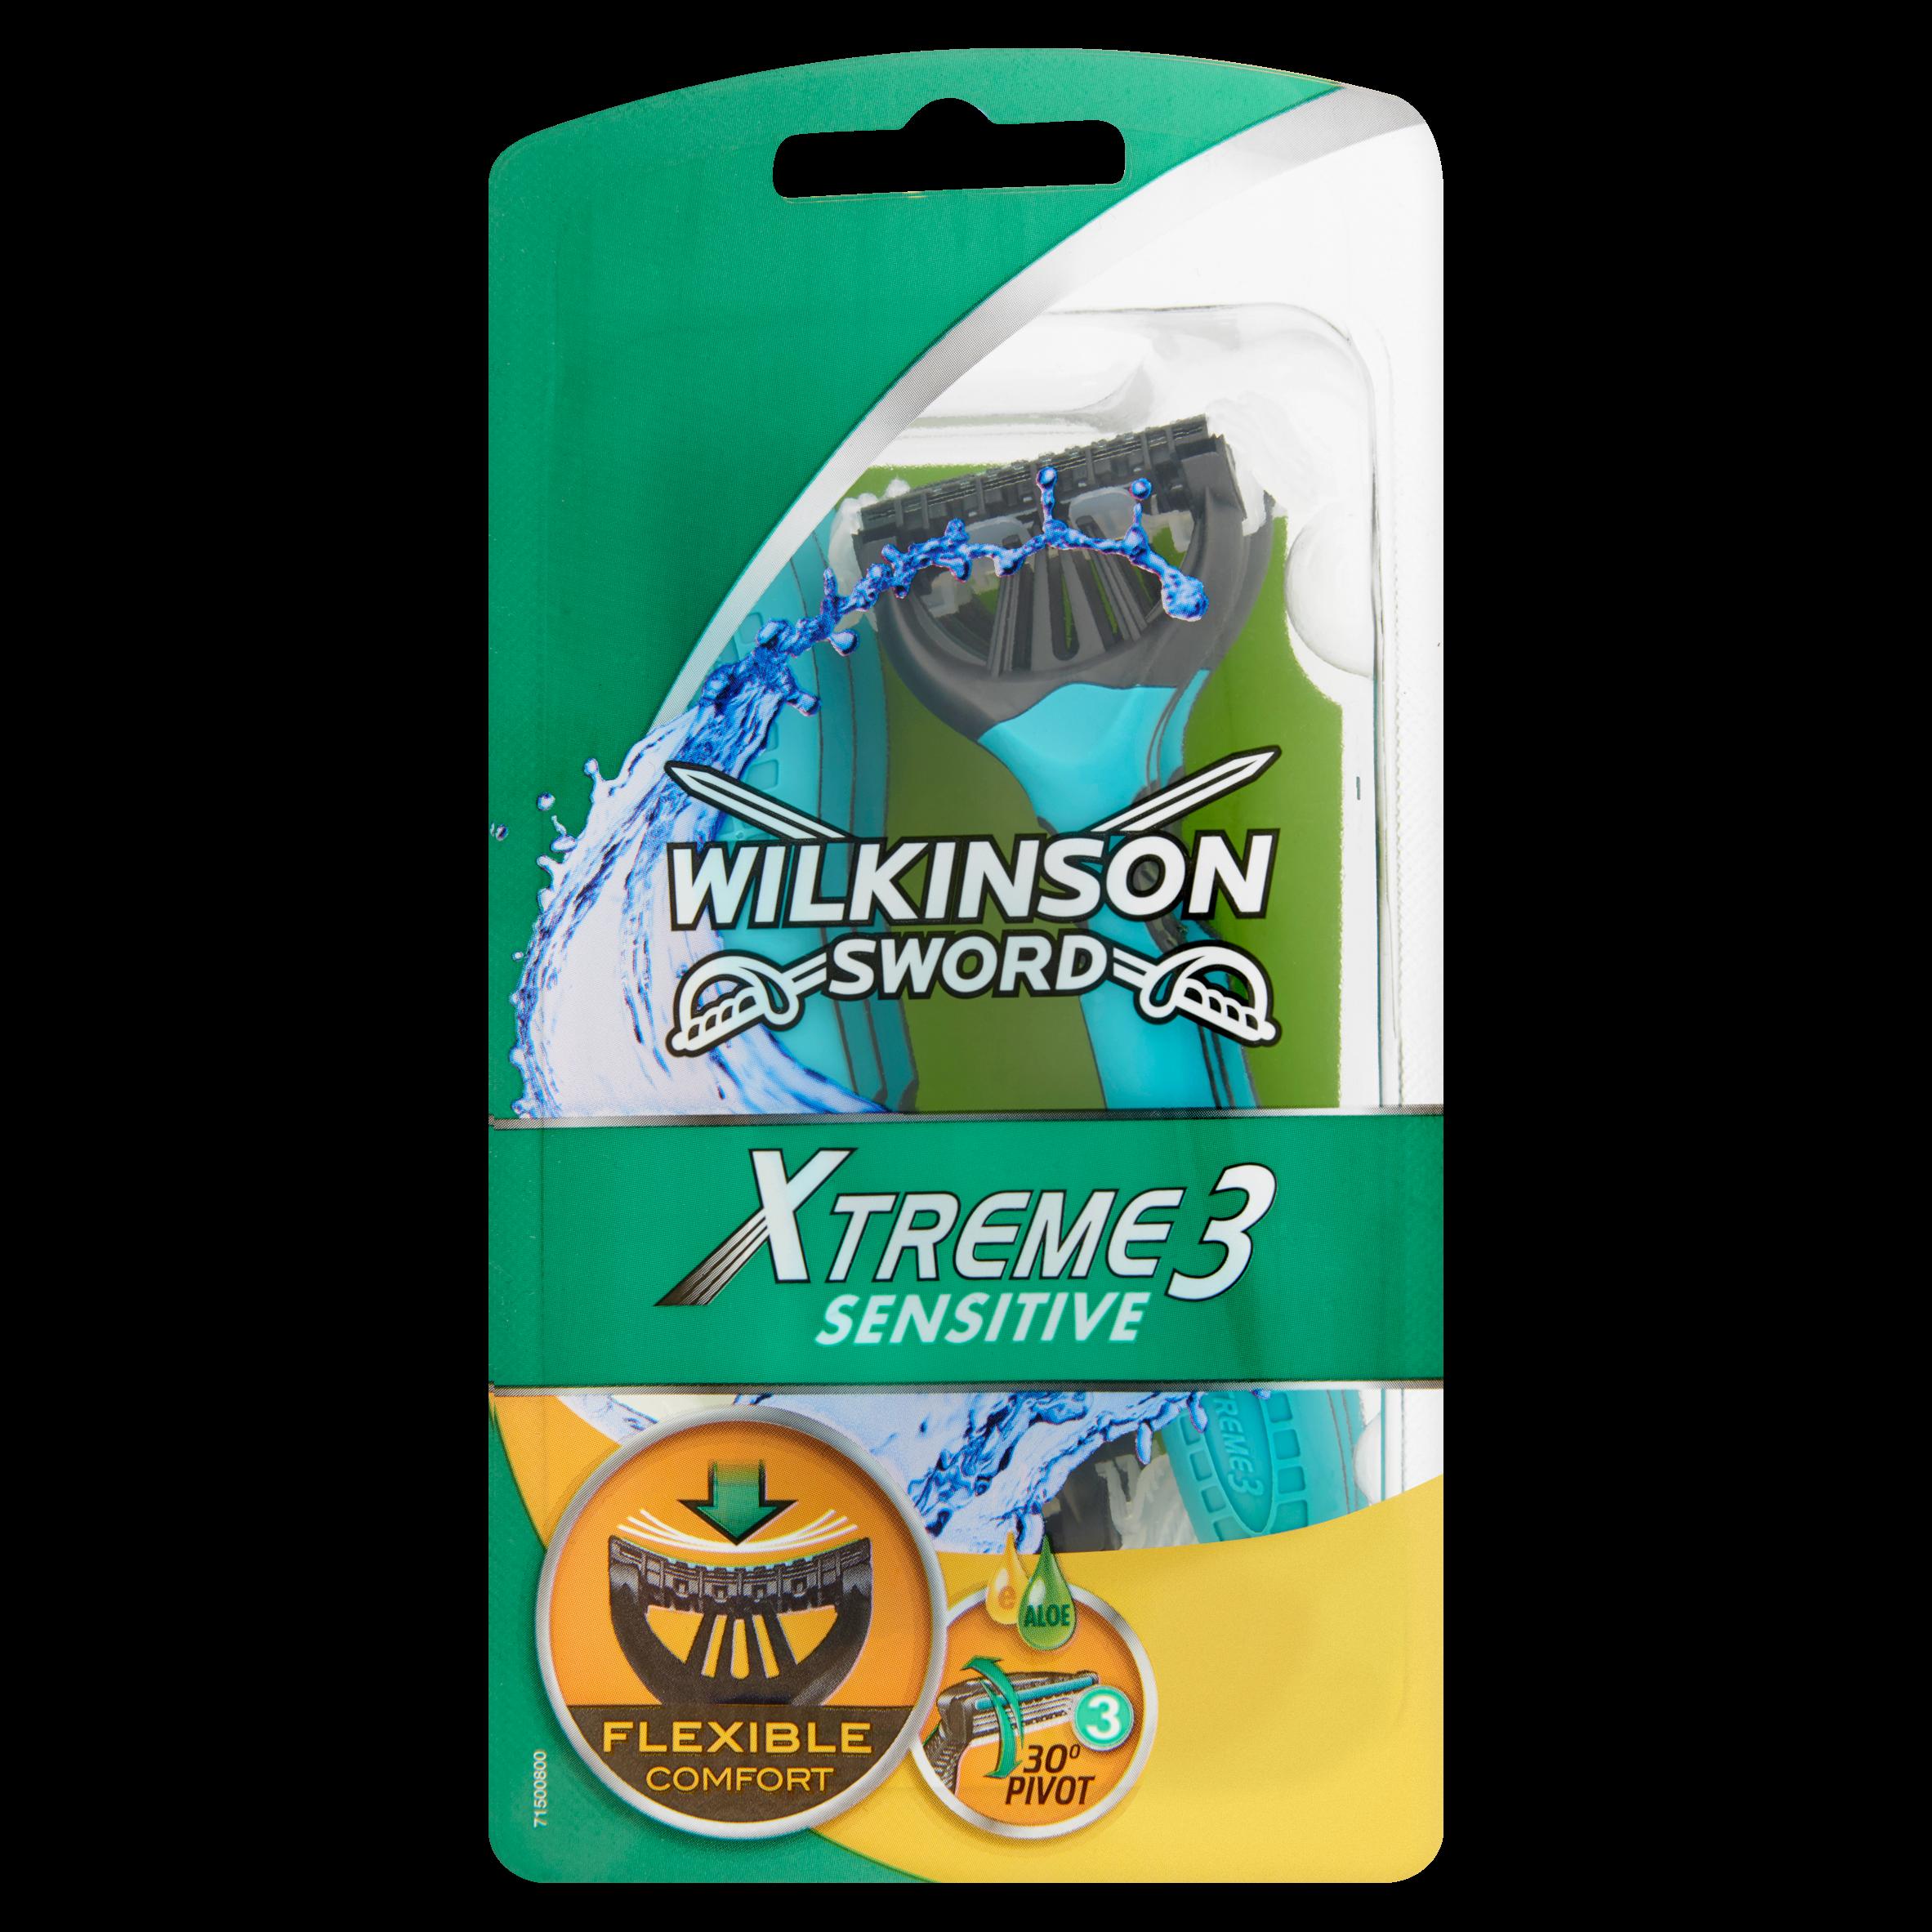 Wilkinson Sword Xtreme 3 Sensitive 6 Stuks